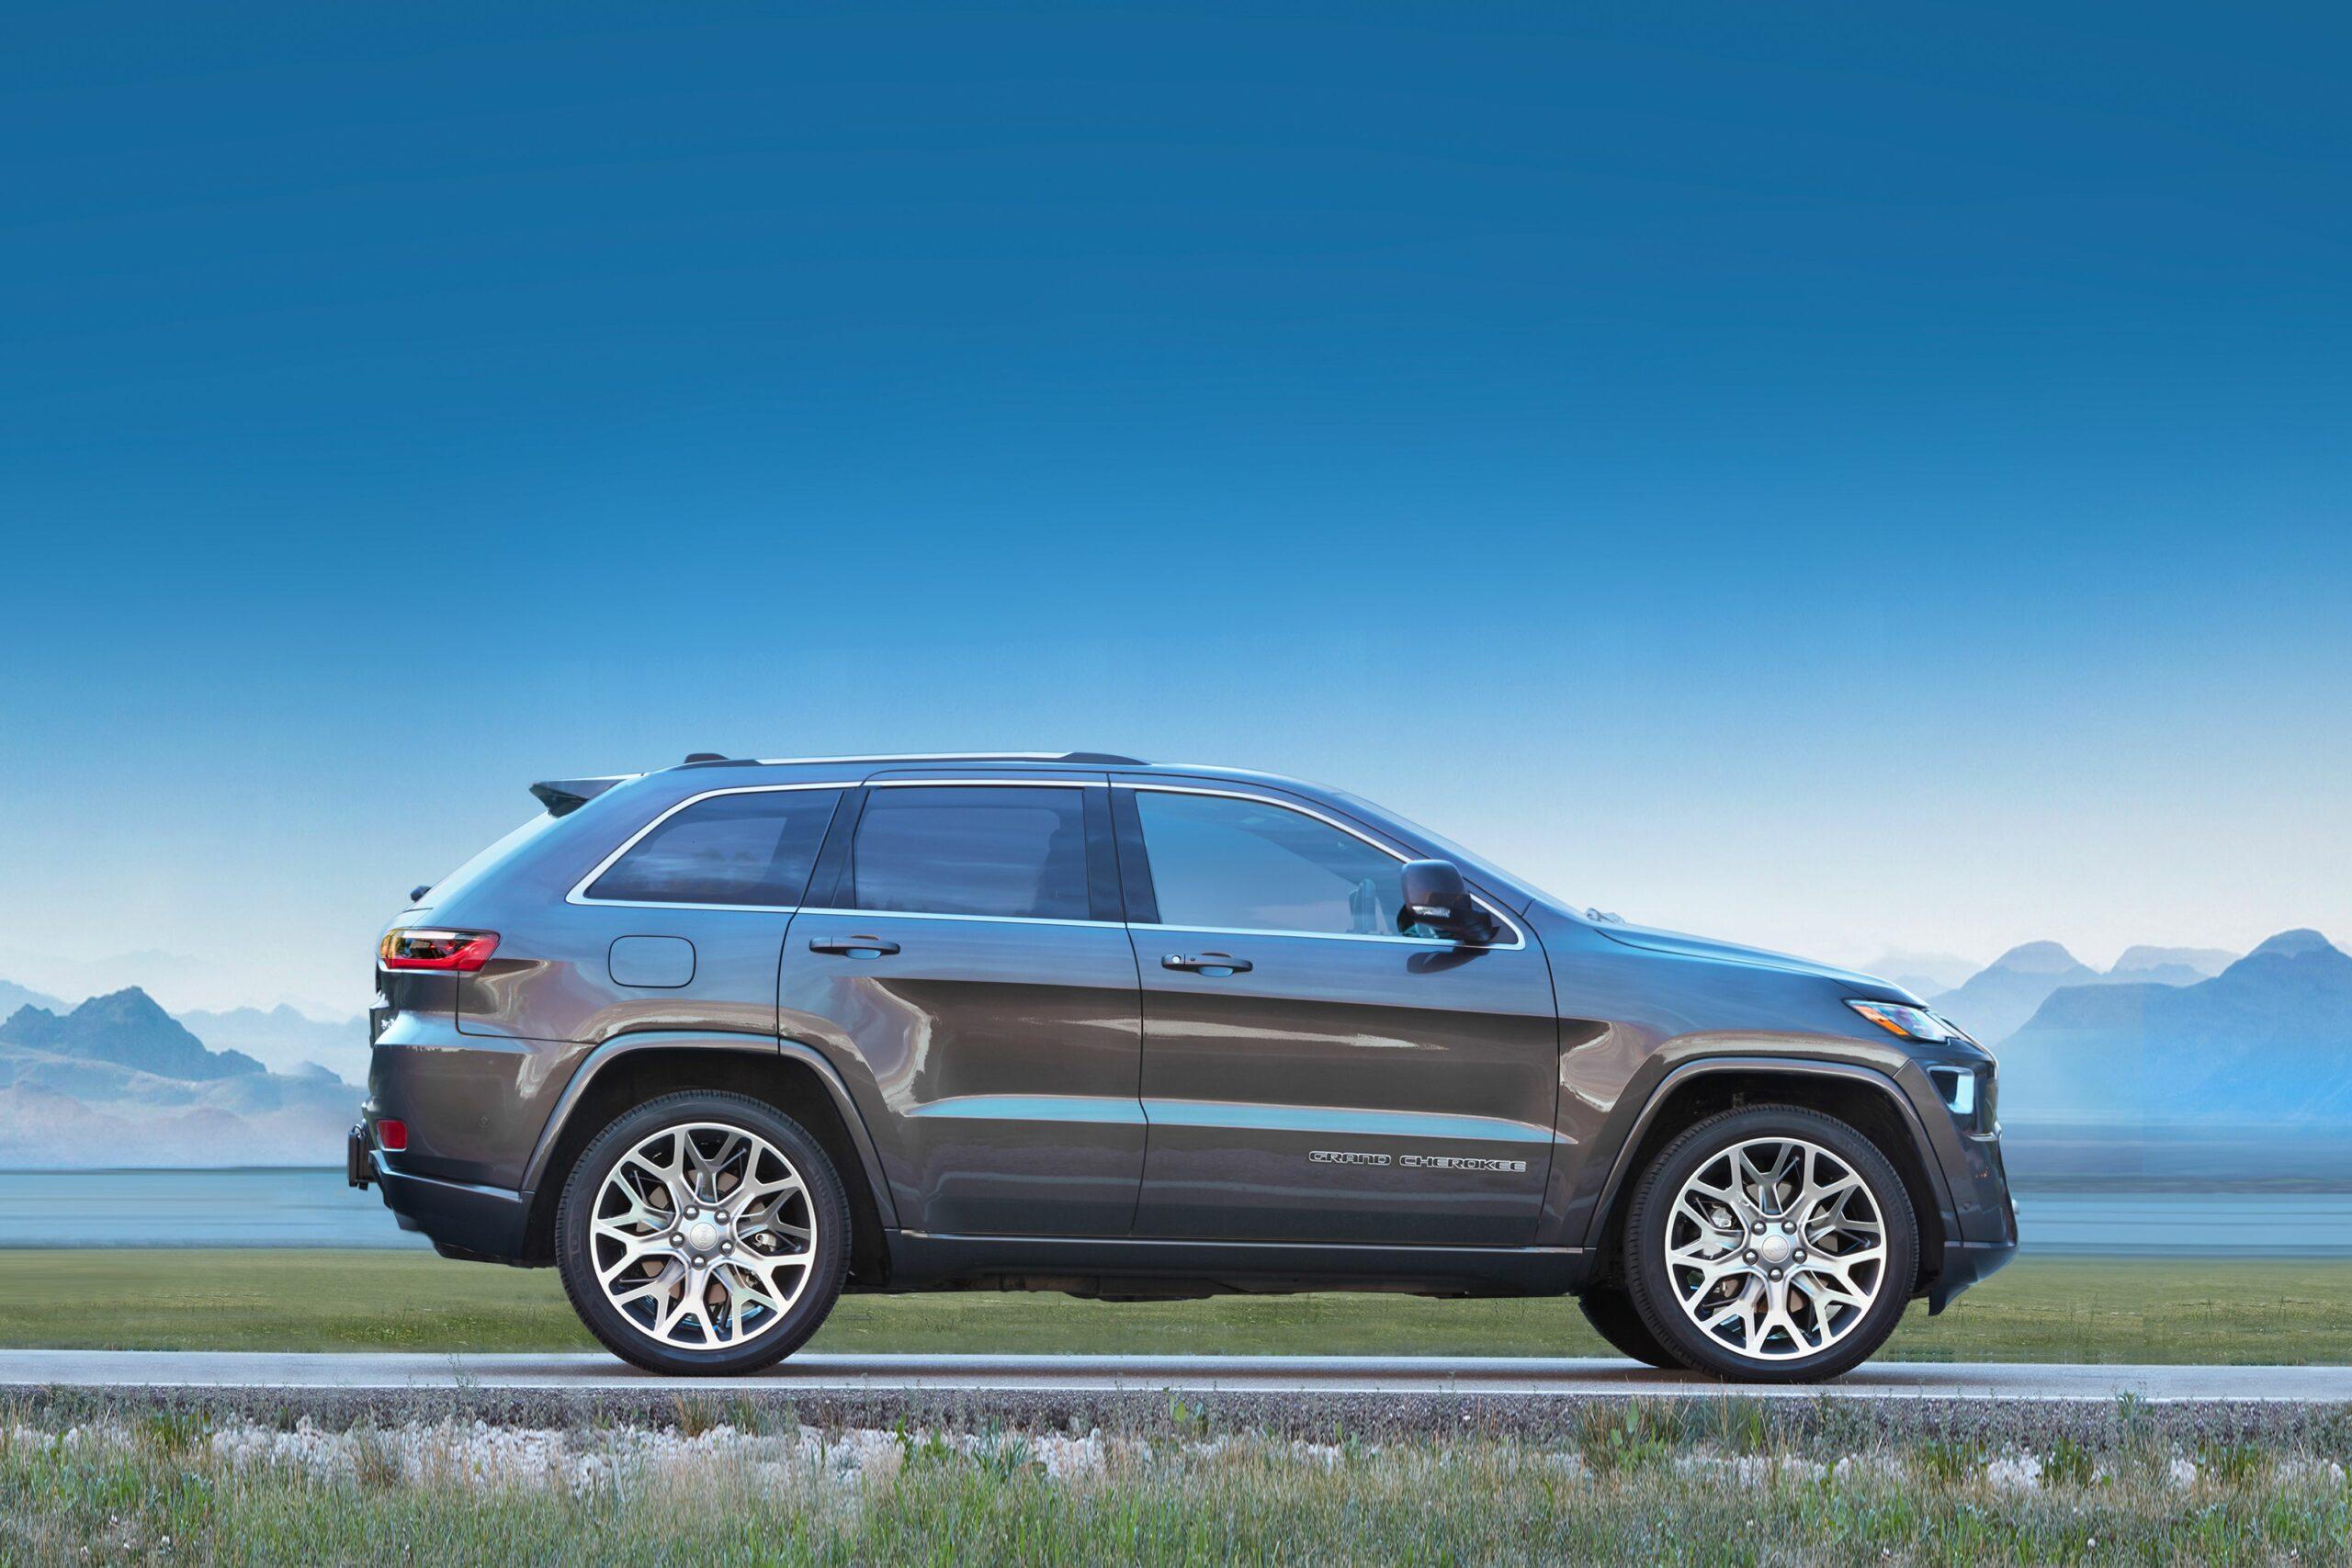 2021 jeep grand cherokee srt8